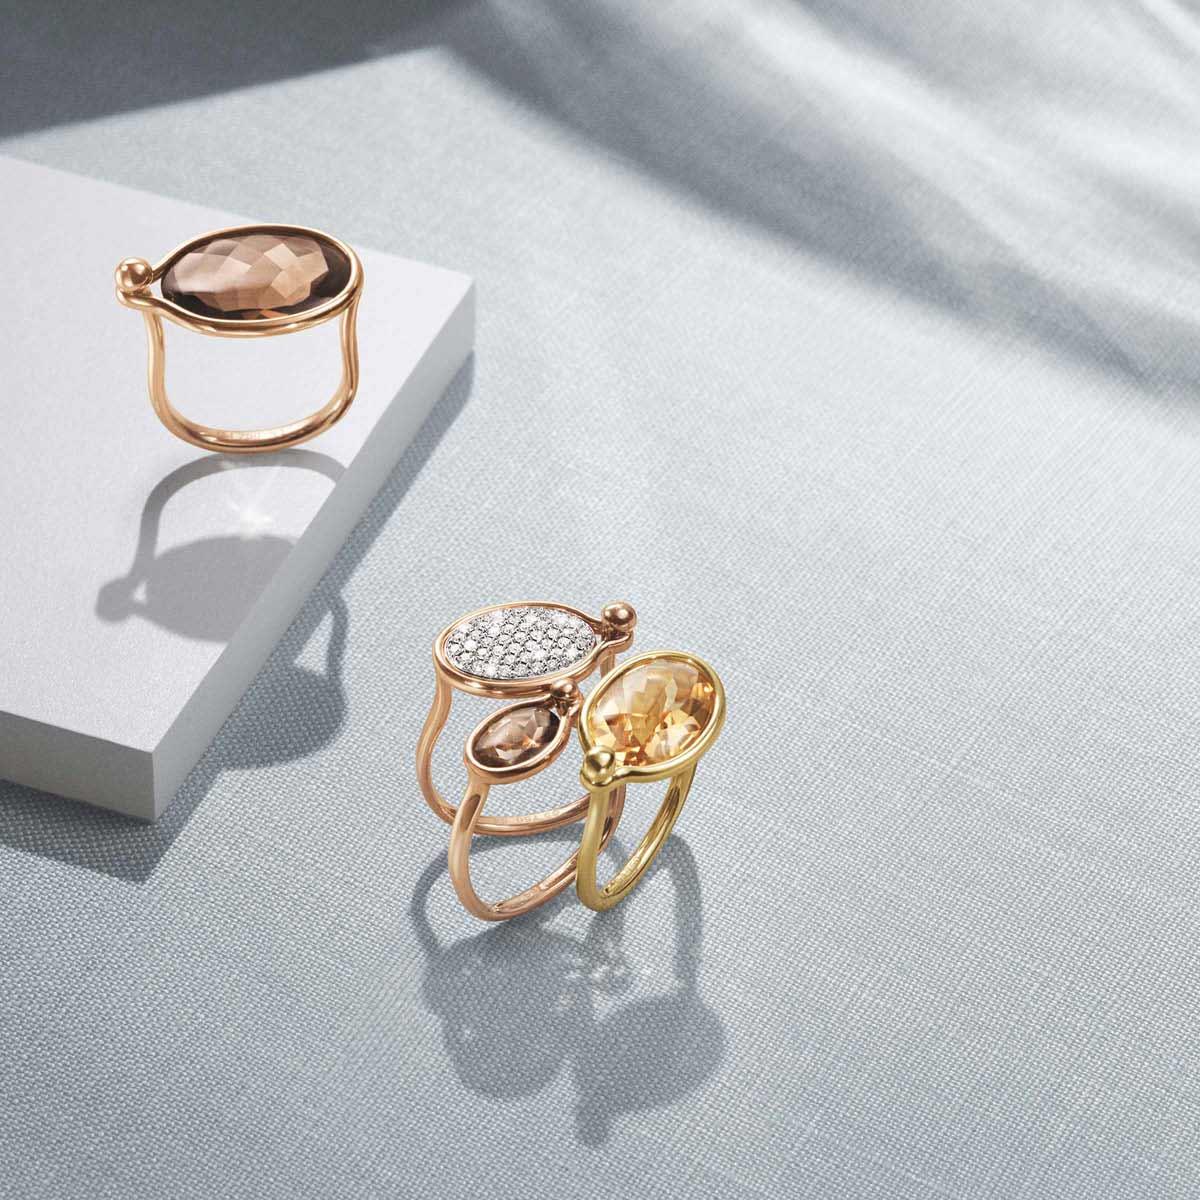 Savannah rings (medium) in rose and yellow gold with smokey quartz, citrine and pavé set white diamonds and Savannah ring (small) in rose gold with smokey quartz